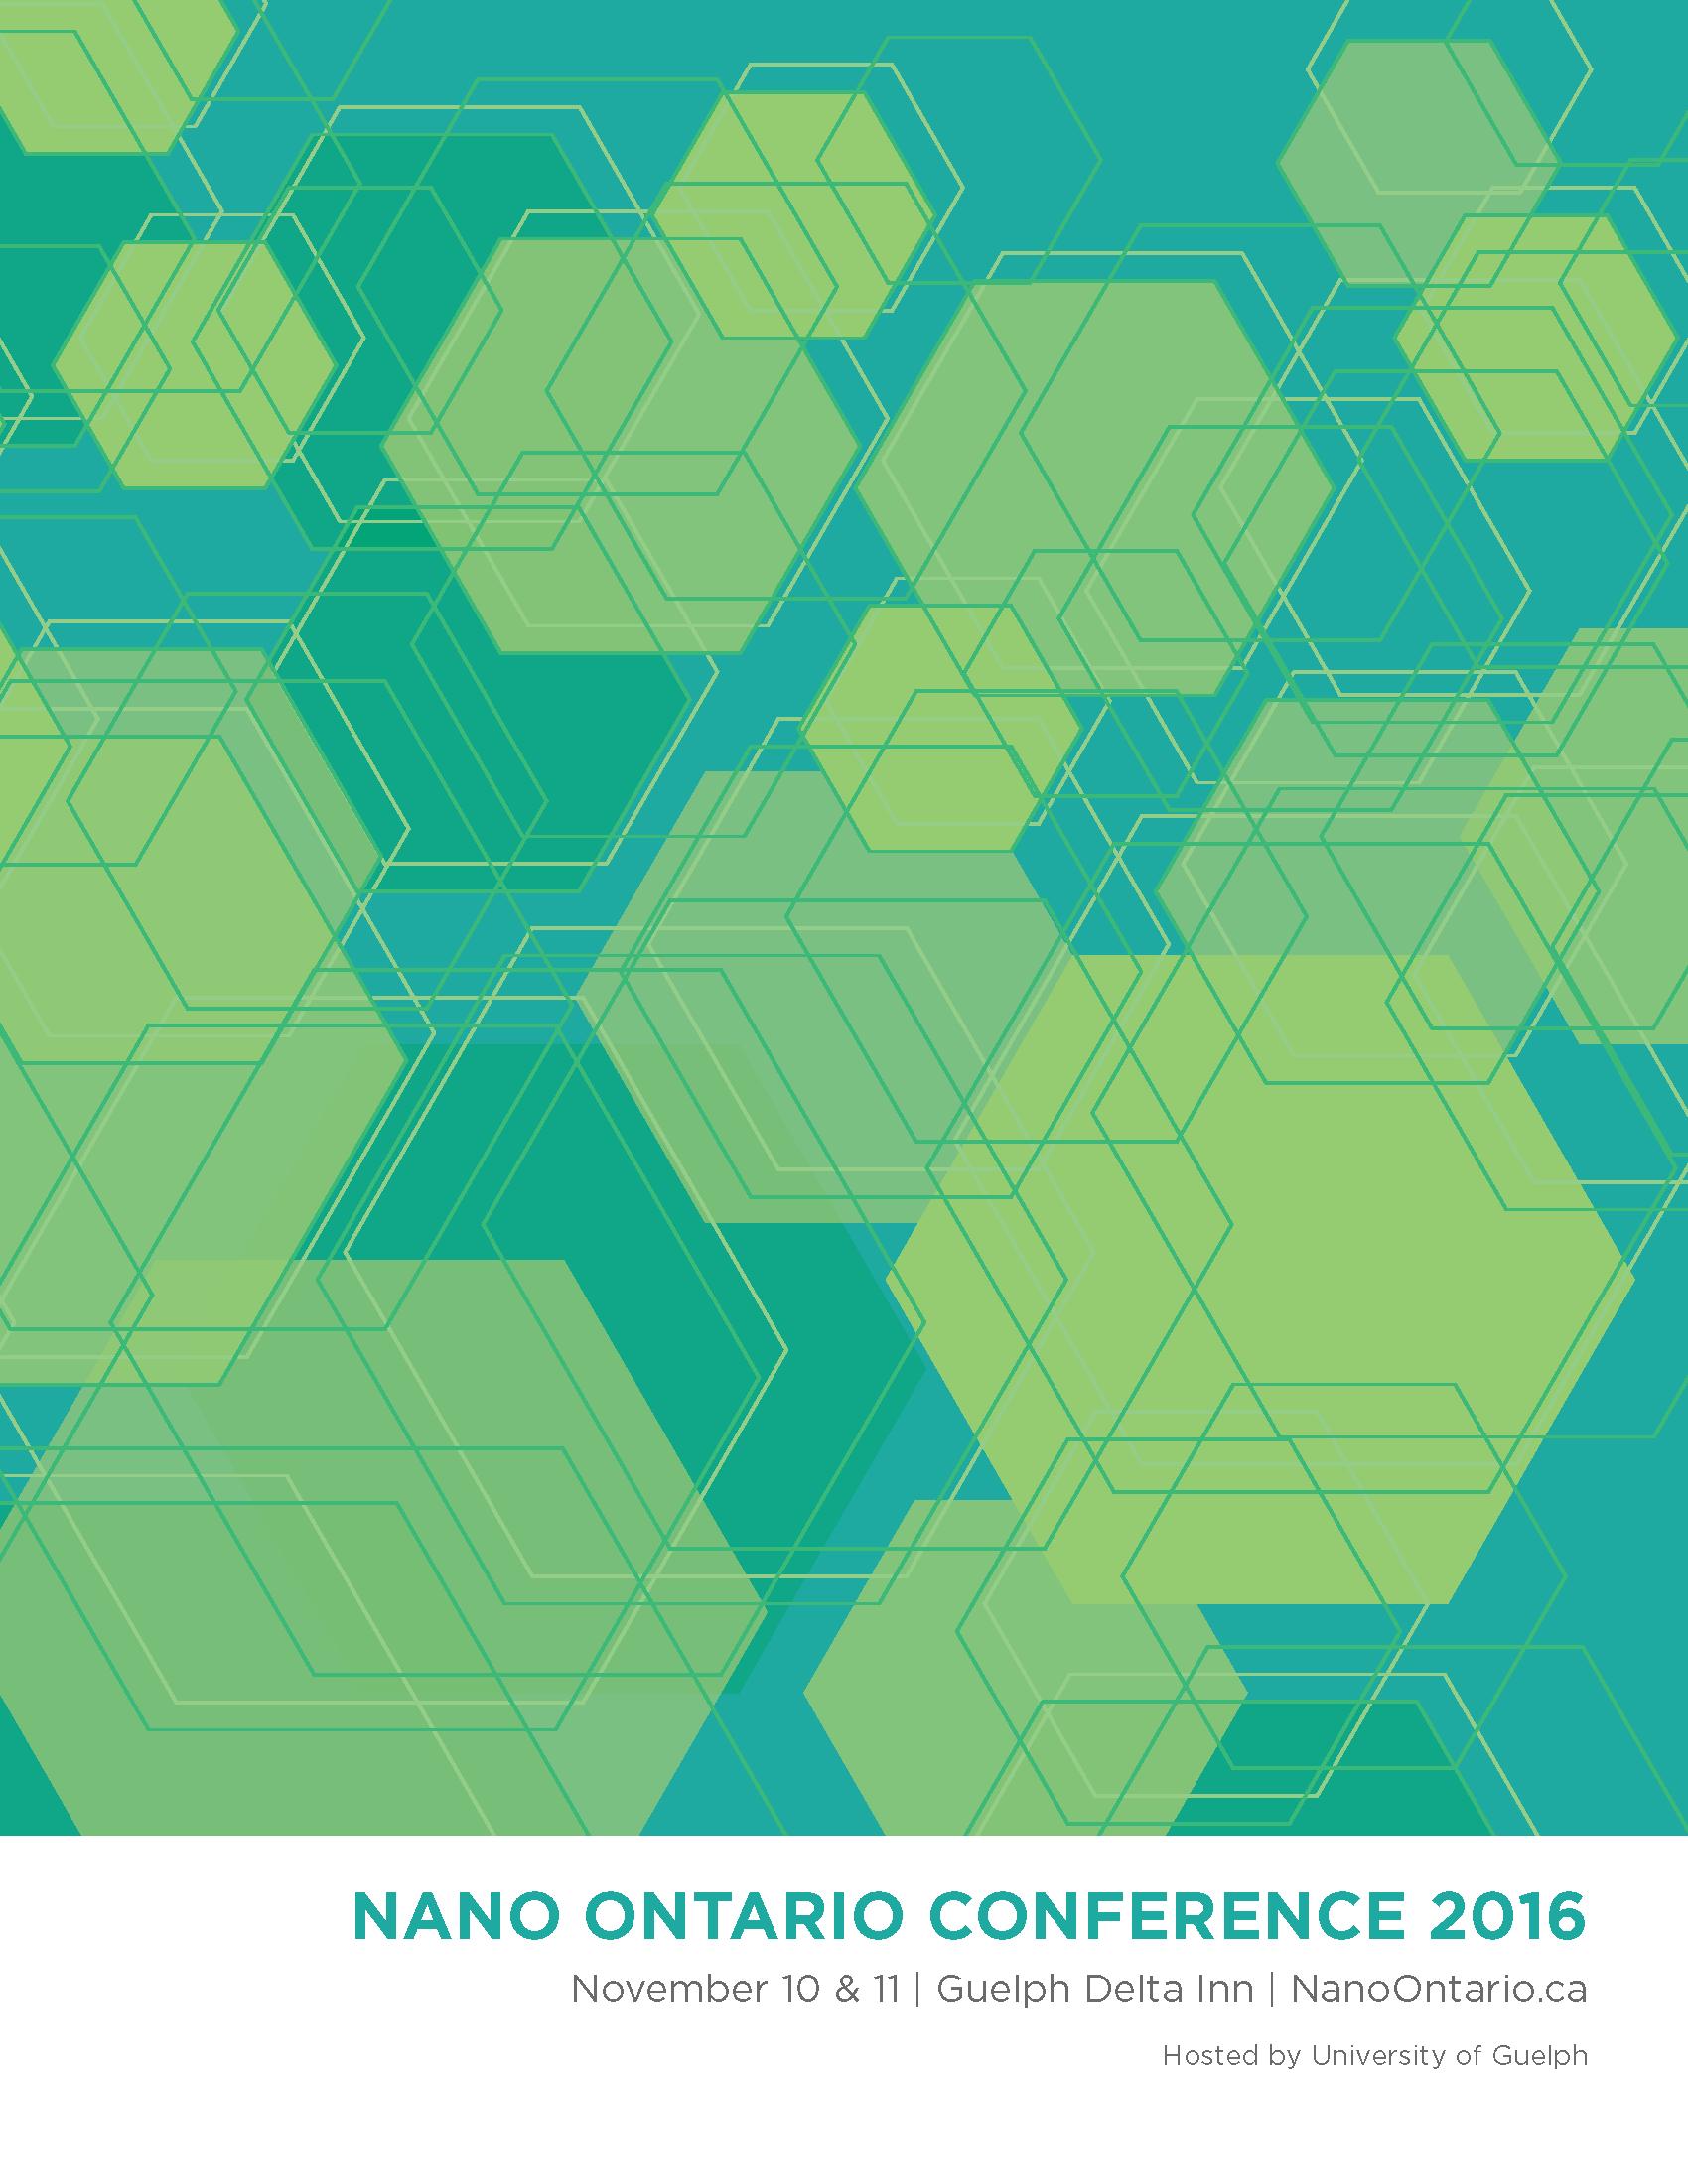 nanoontario 2016